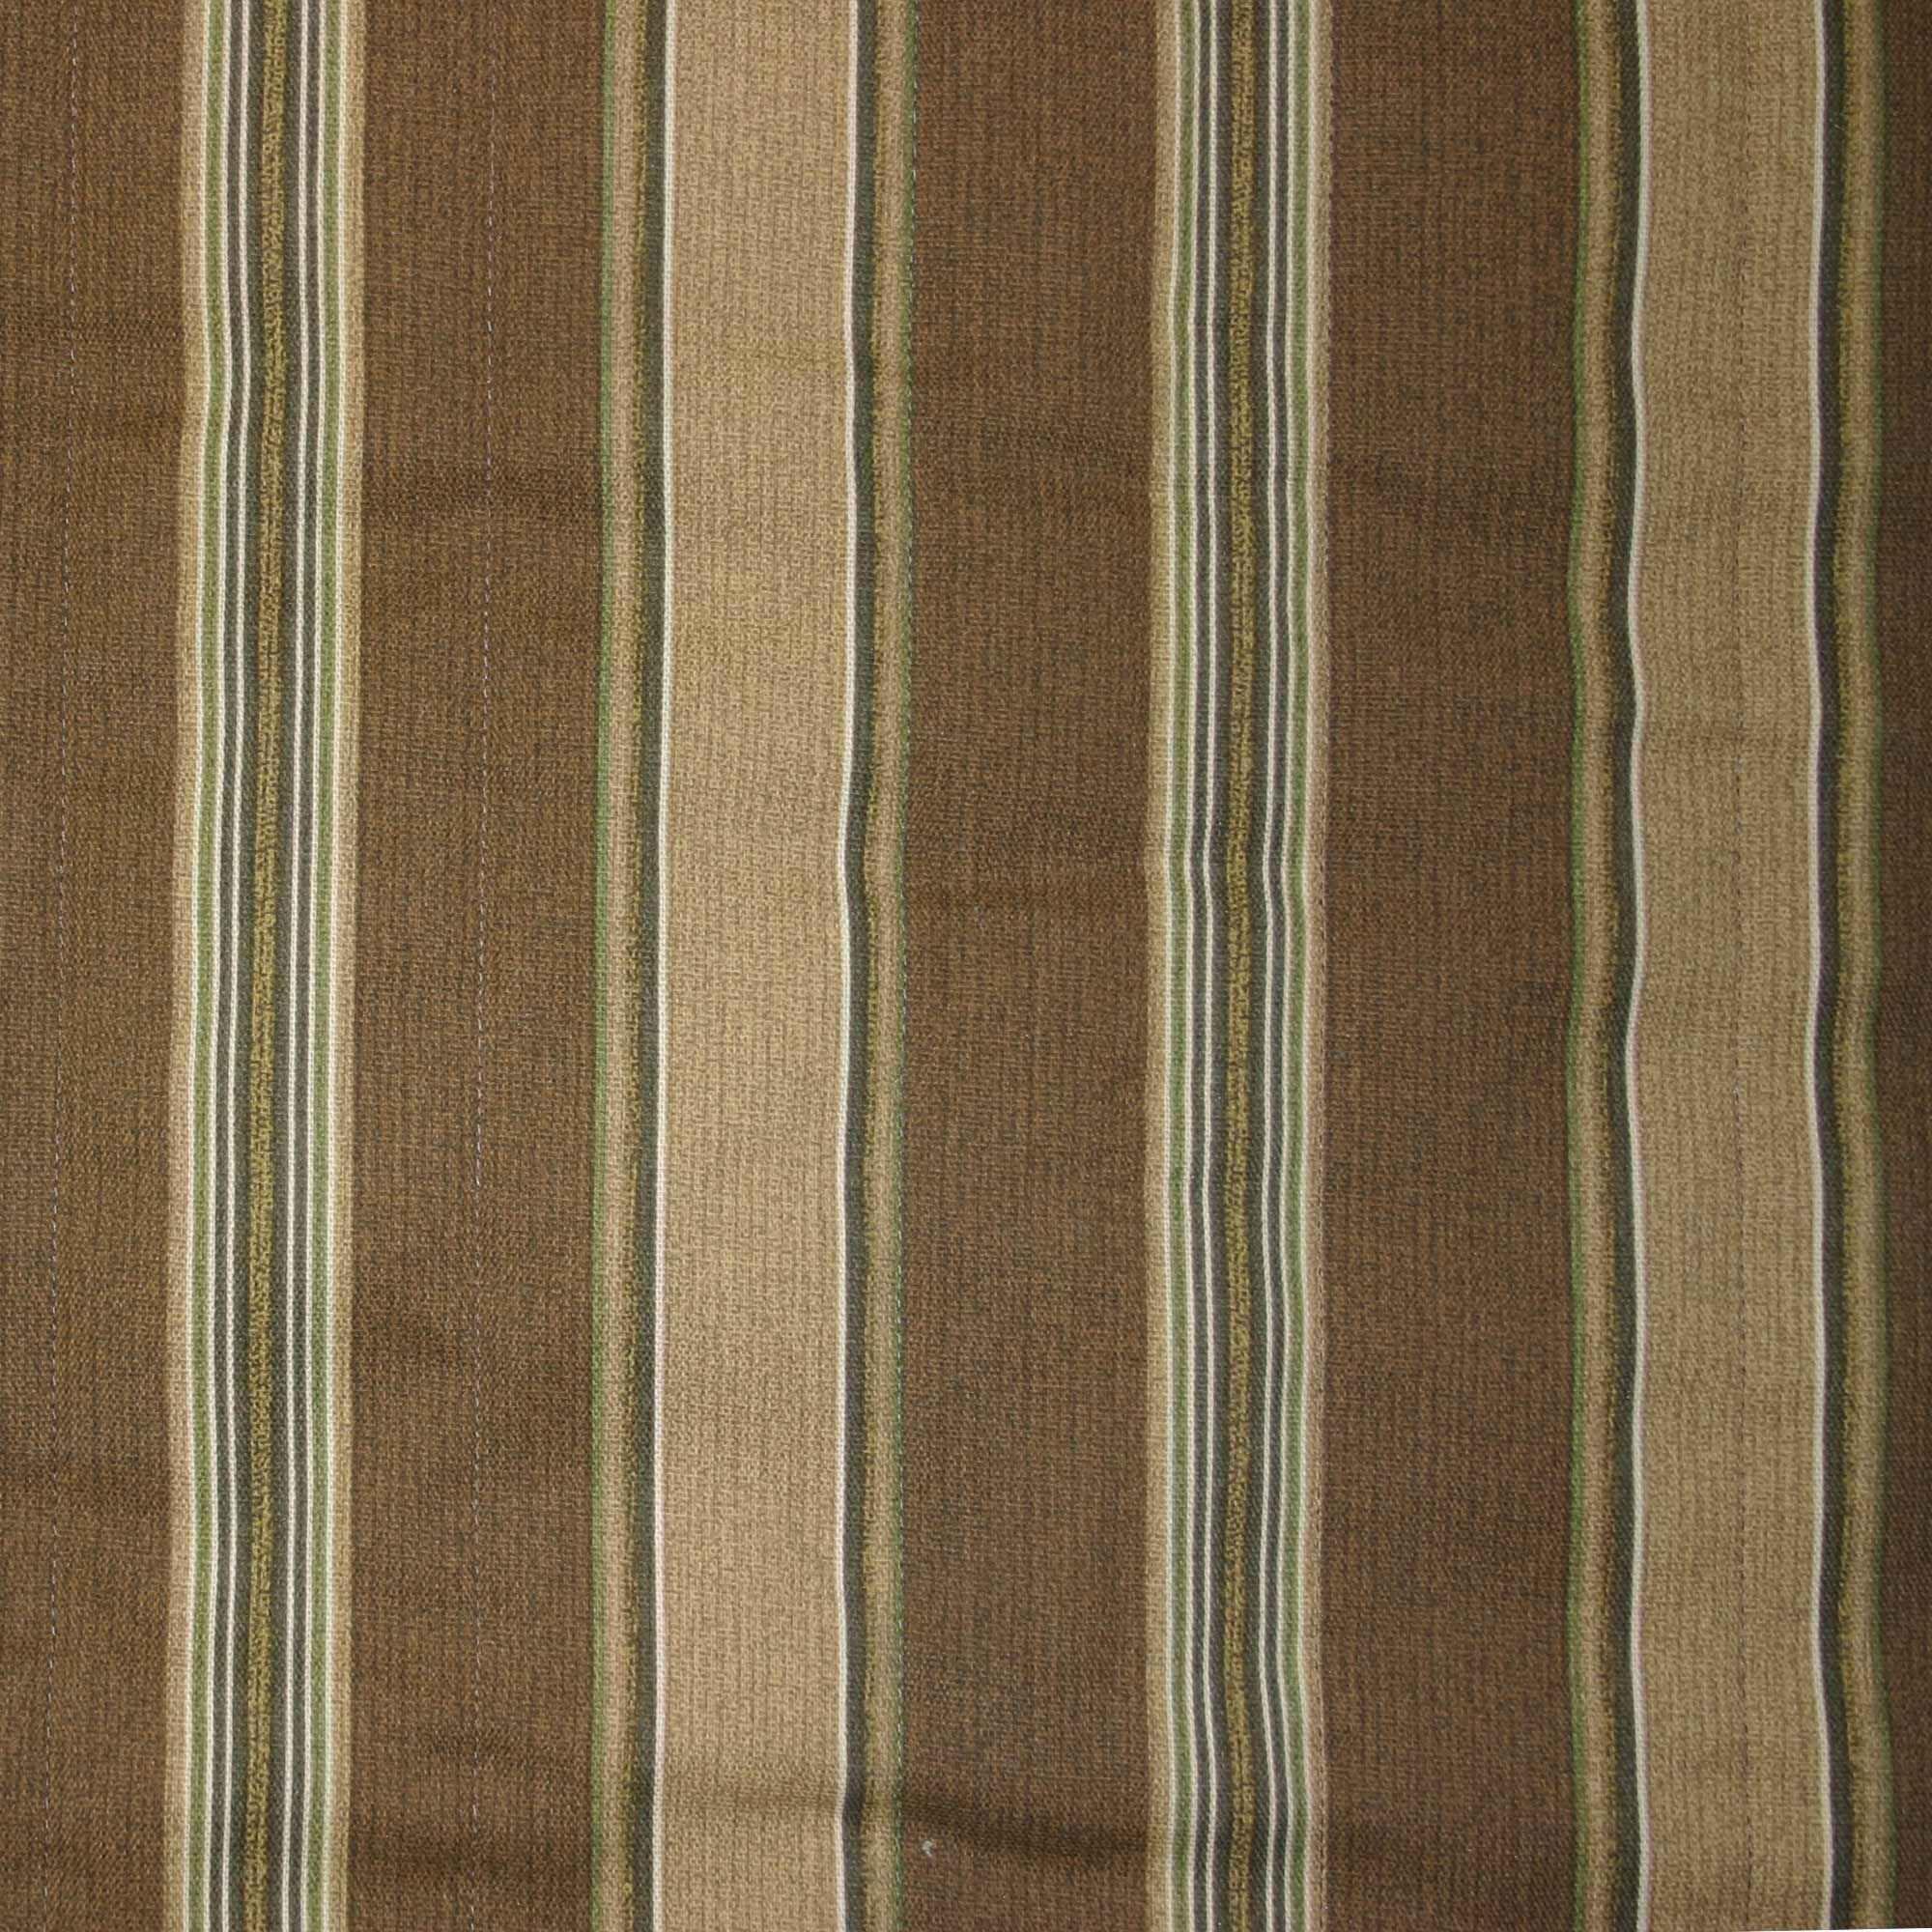 Castaway Hammocks Beau Green Amp Brown Stripe Quilted